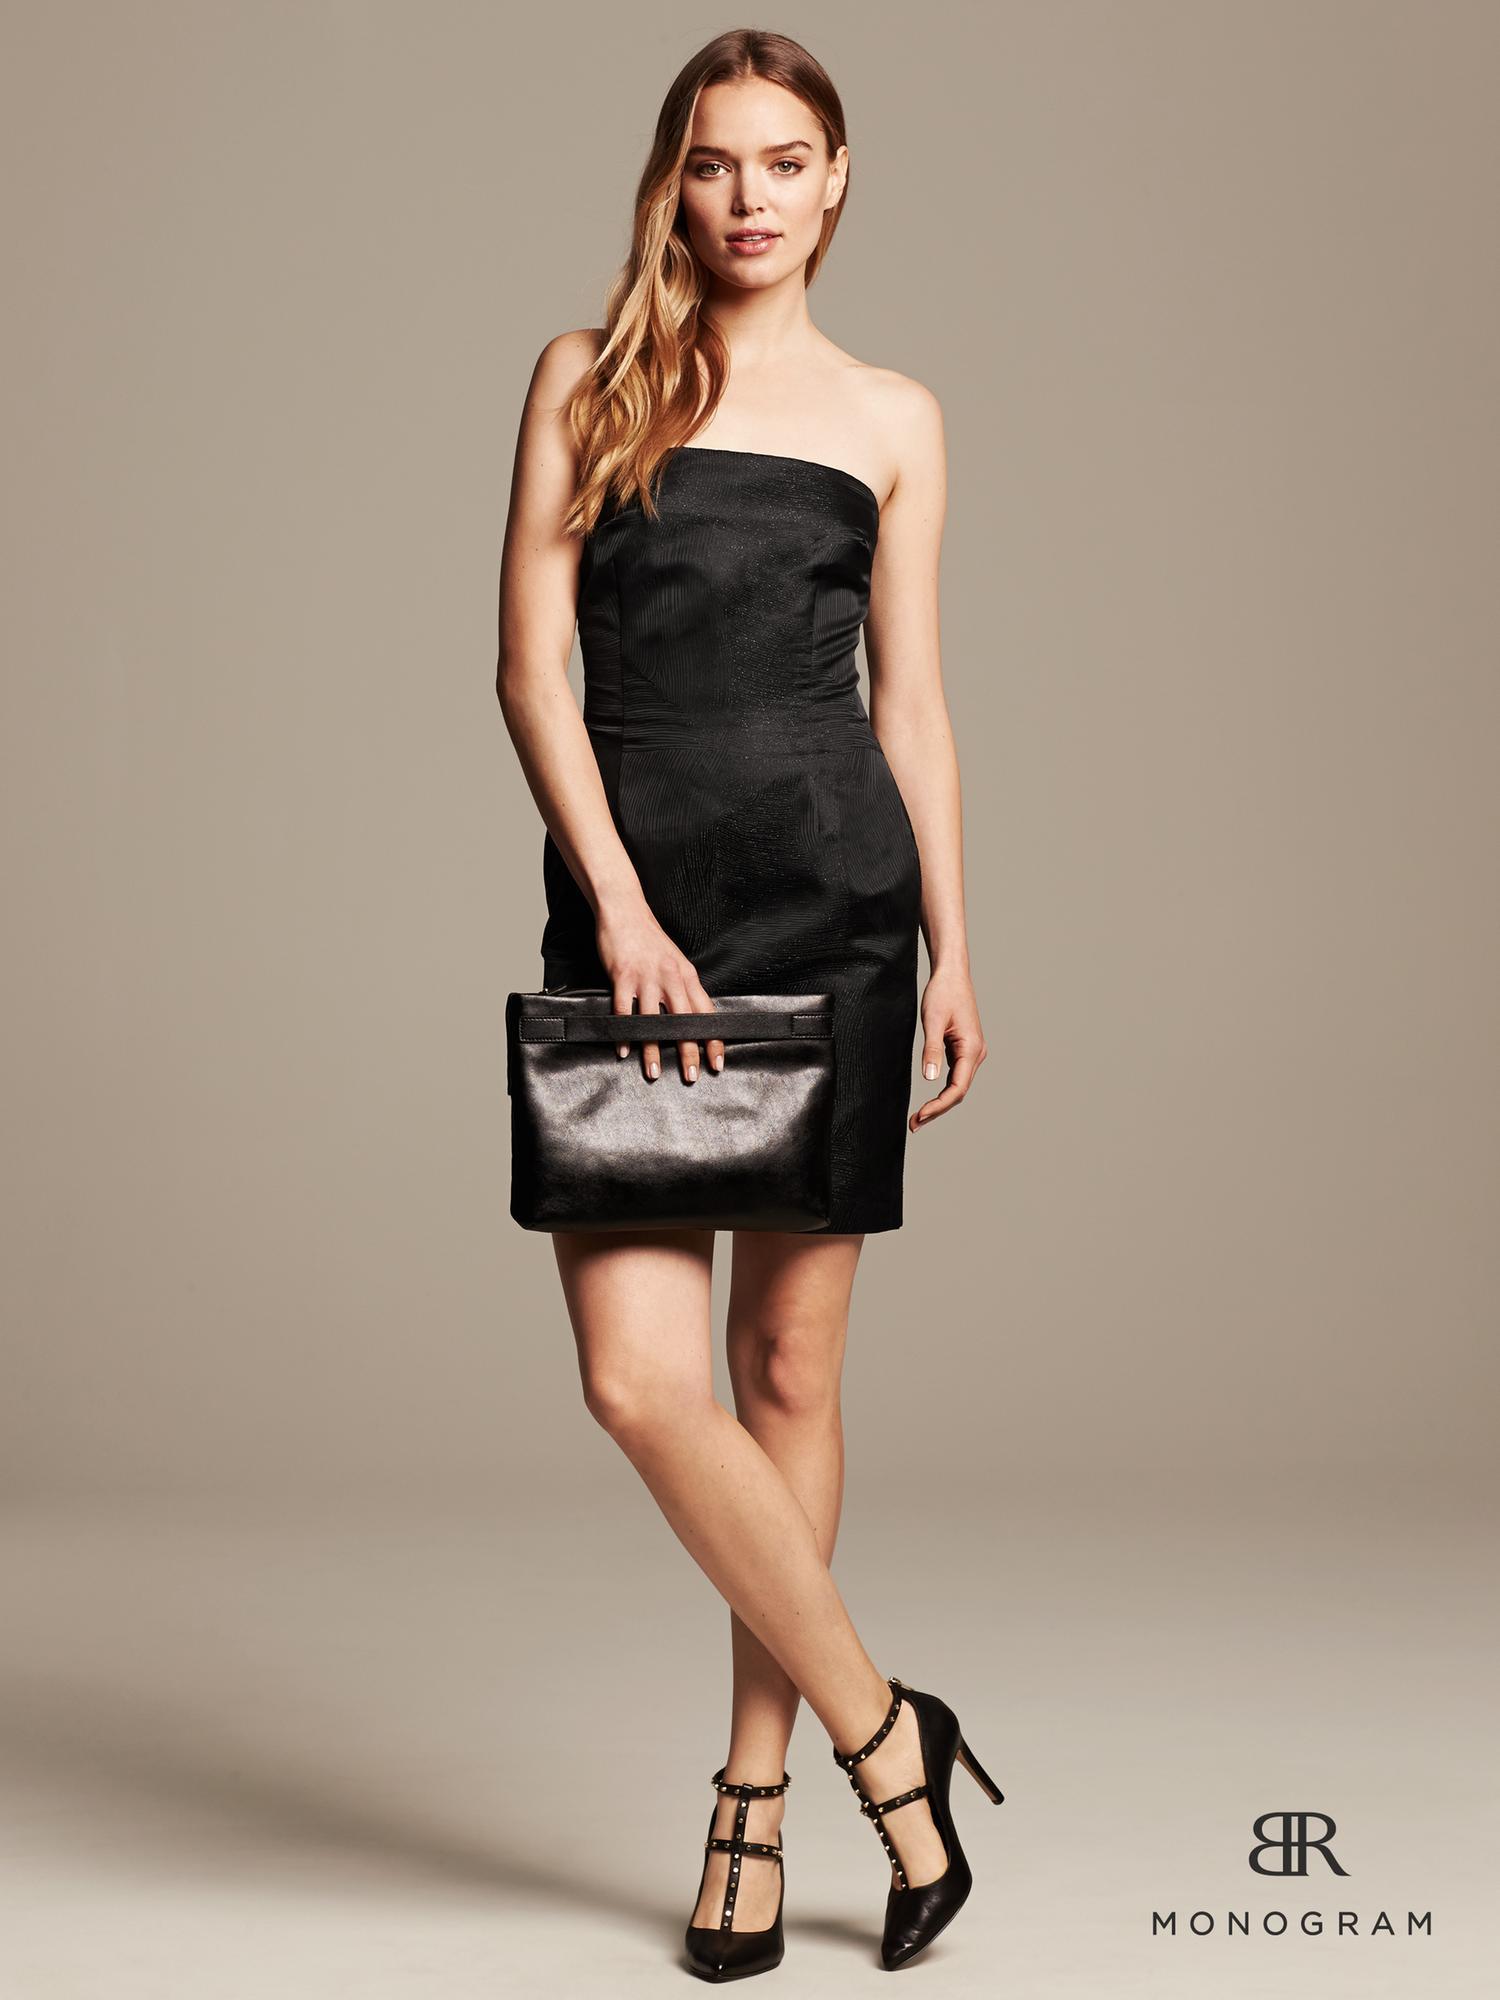 c6cf35d0397 Banana Republic Br Monogram Strapless Shine Dress in Black - Lyst